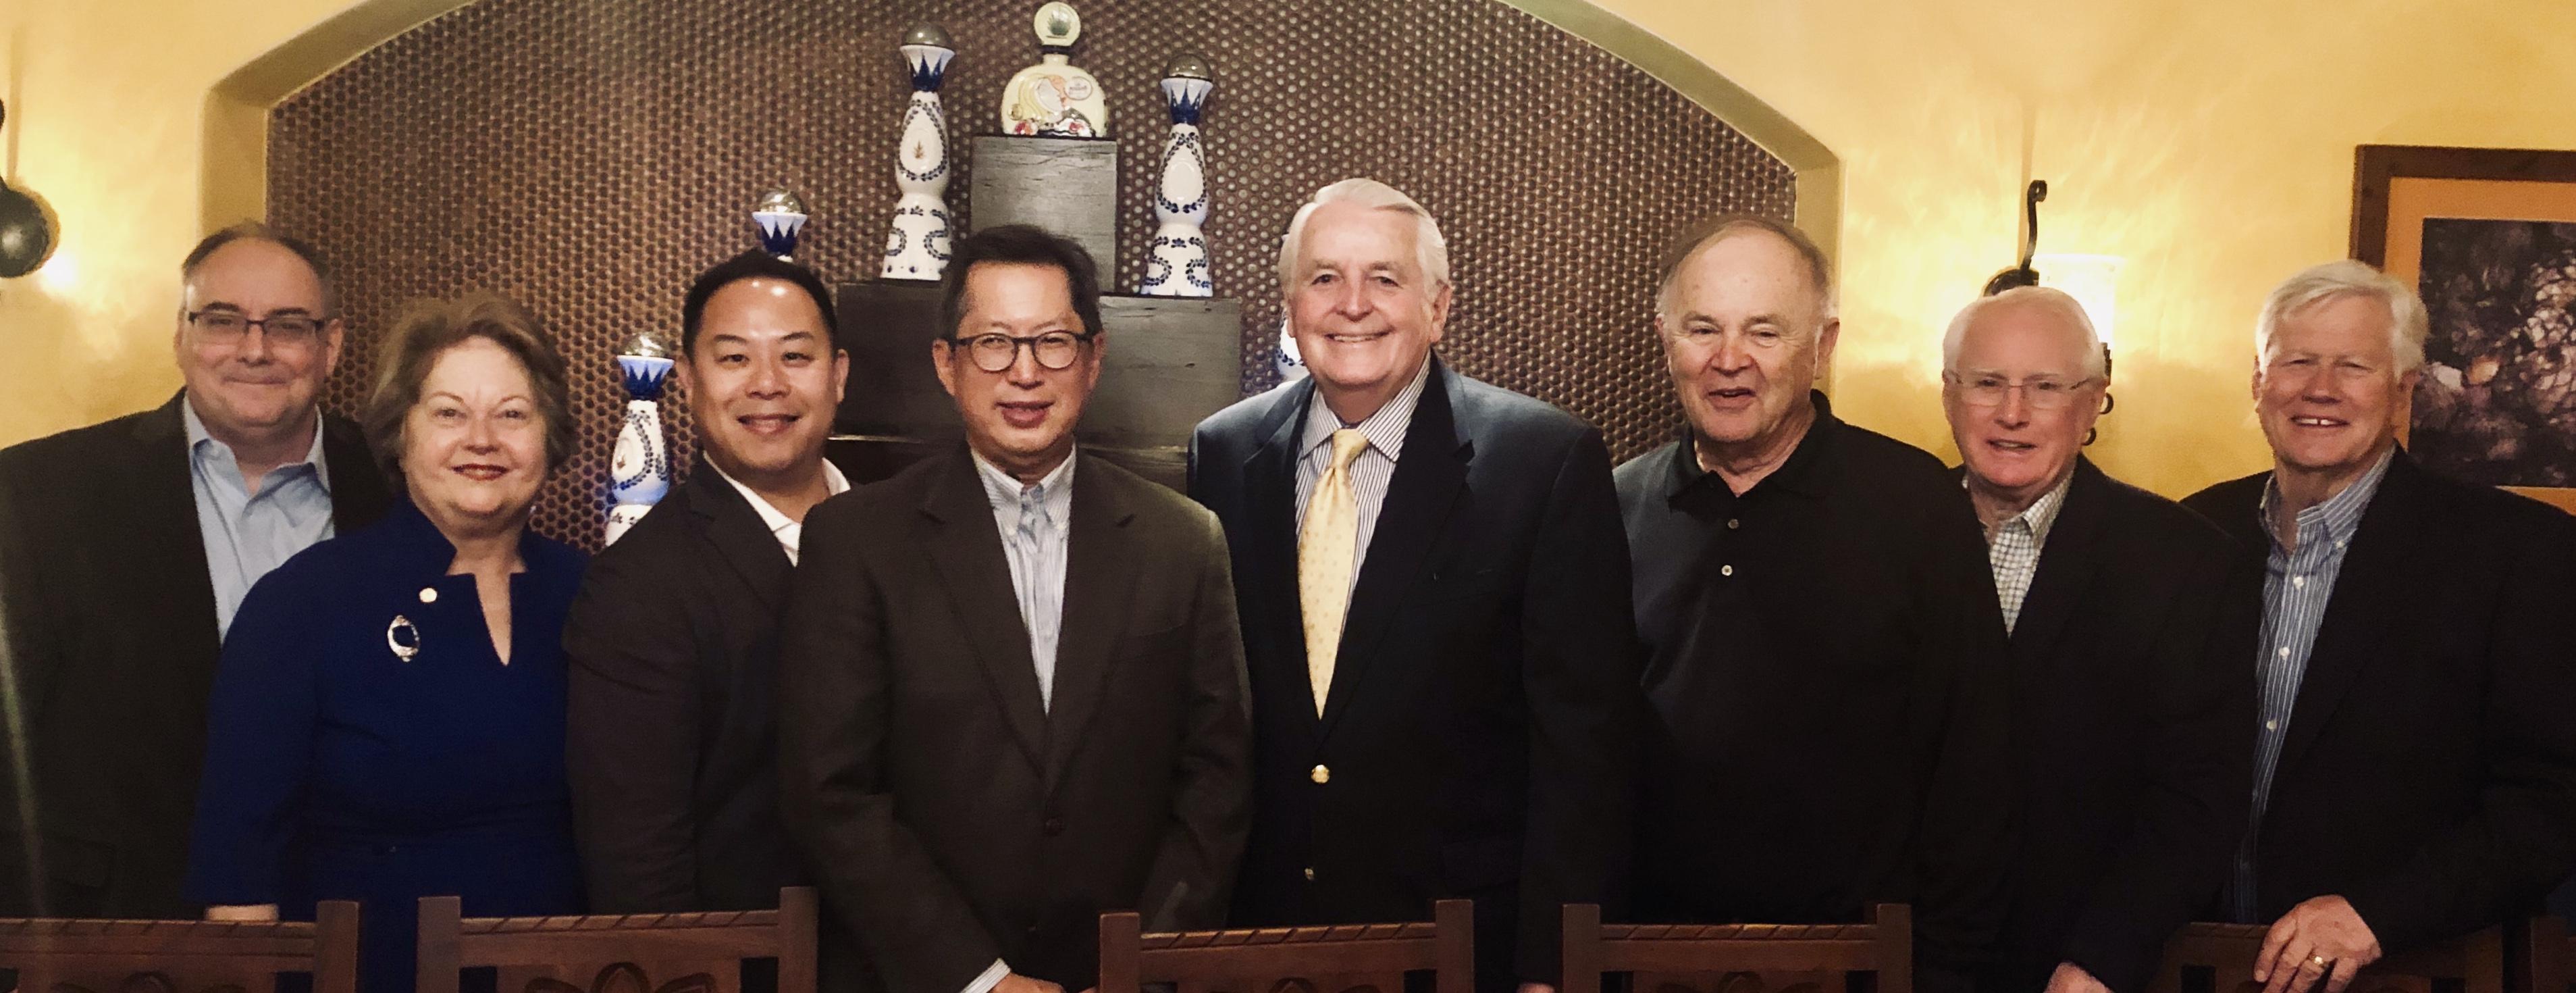 Board of Directors 2017